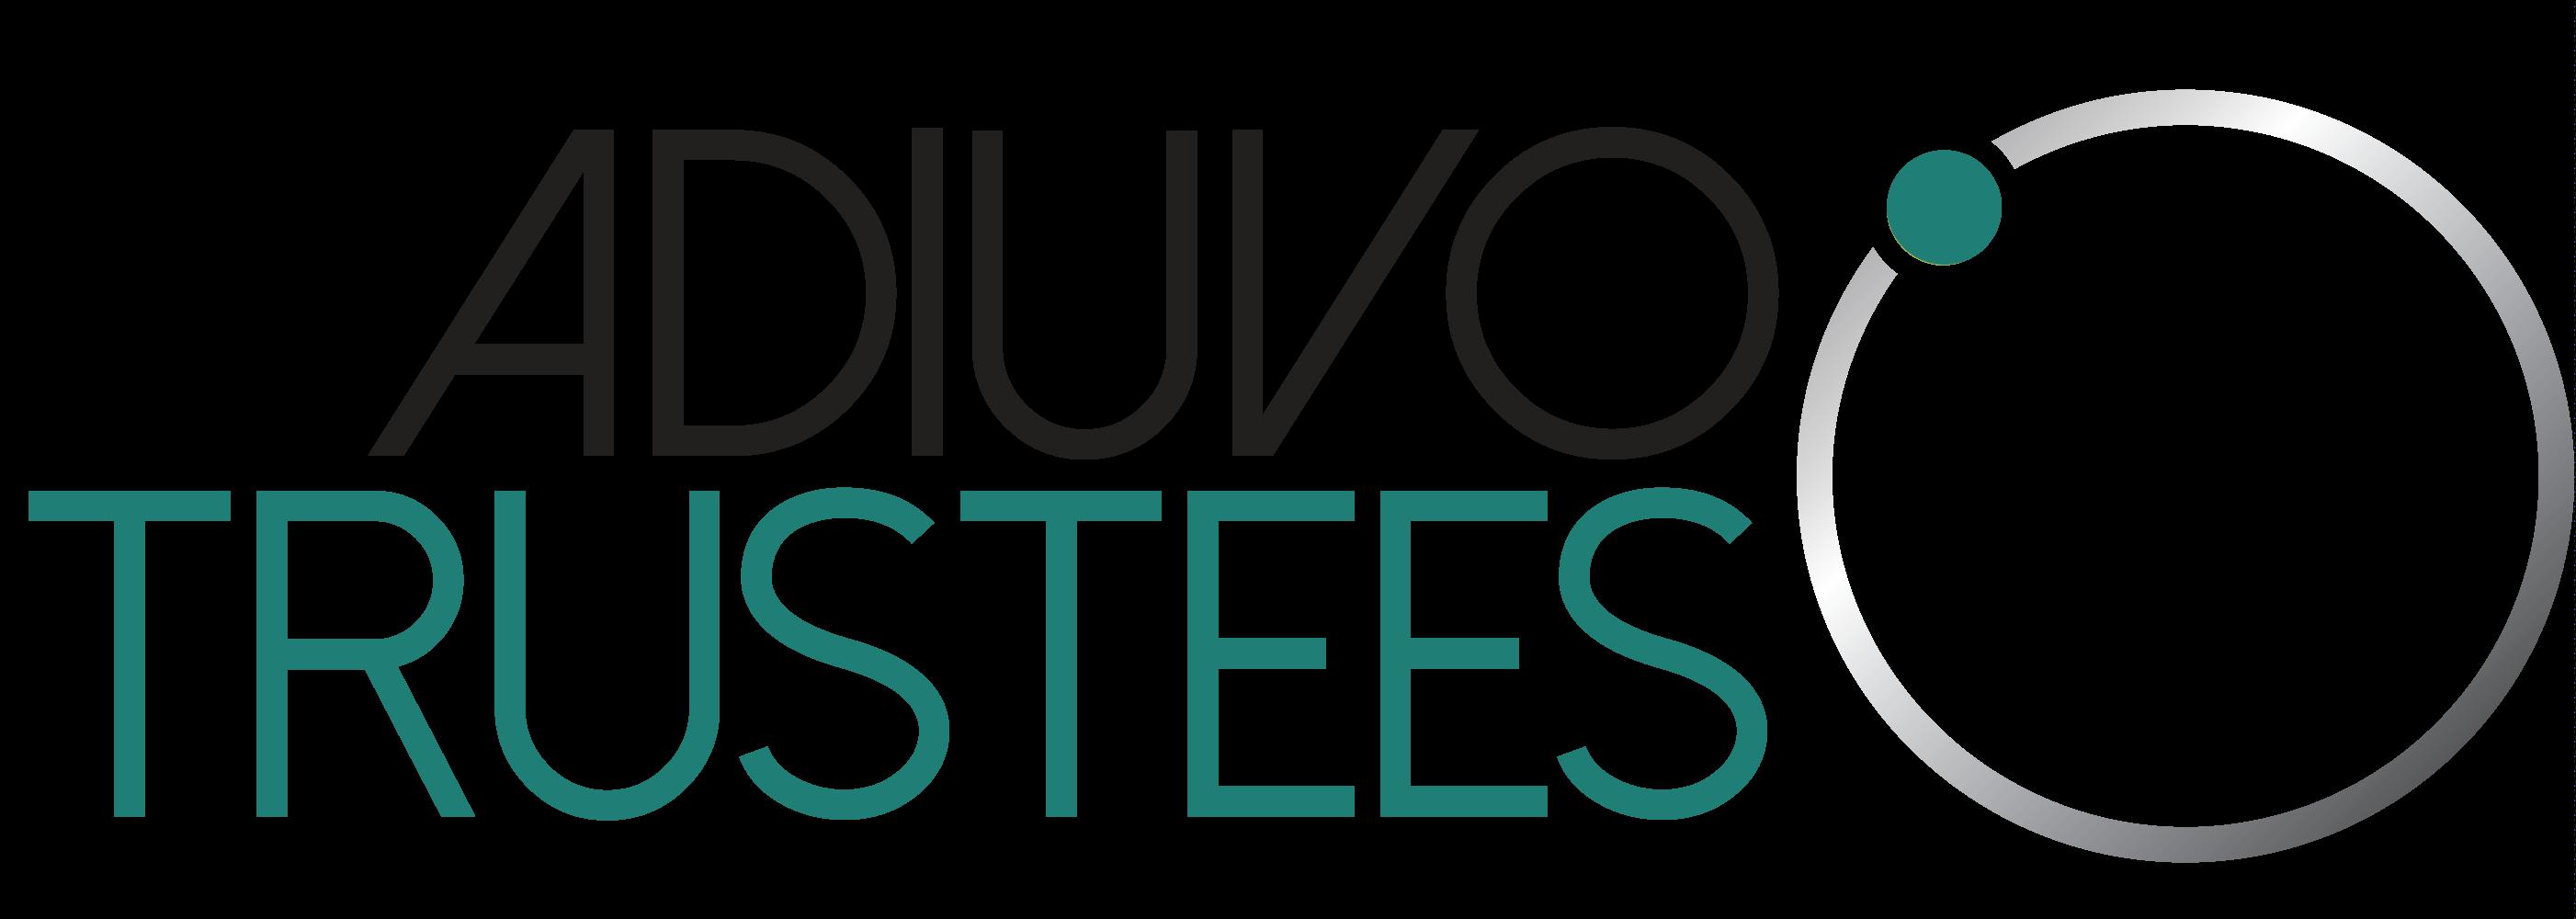 Adiuvo Trustees Ltd